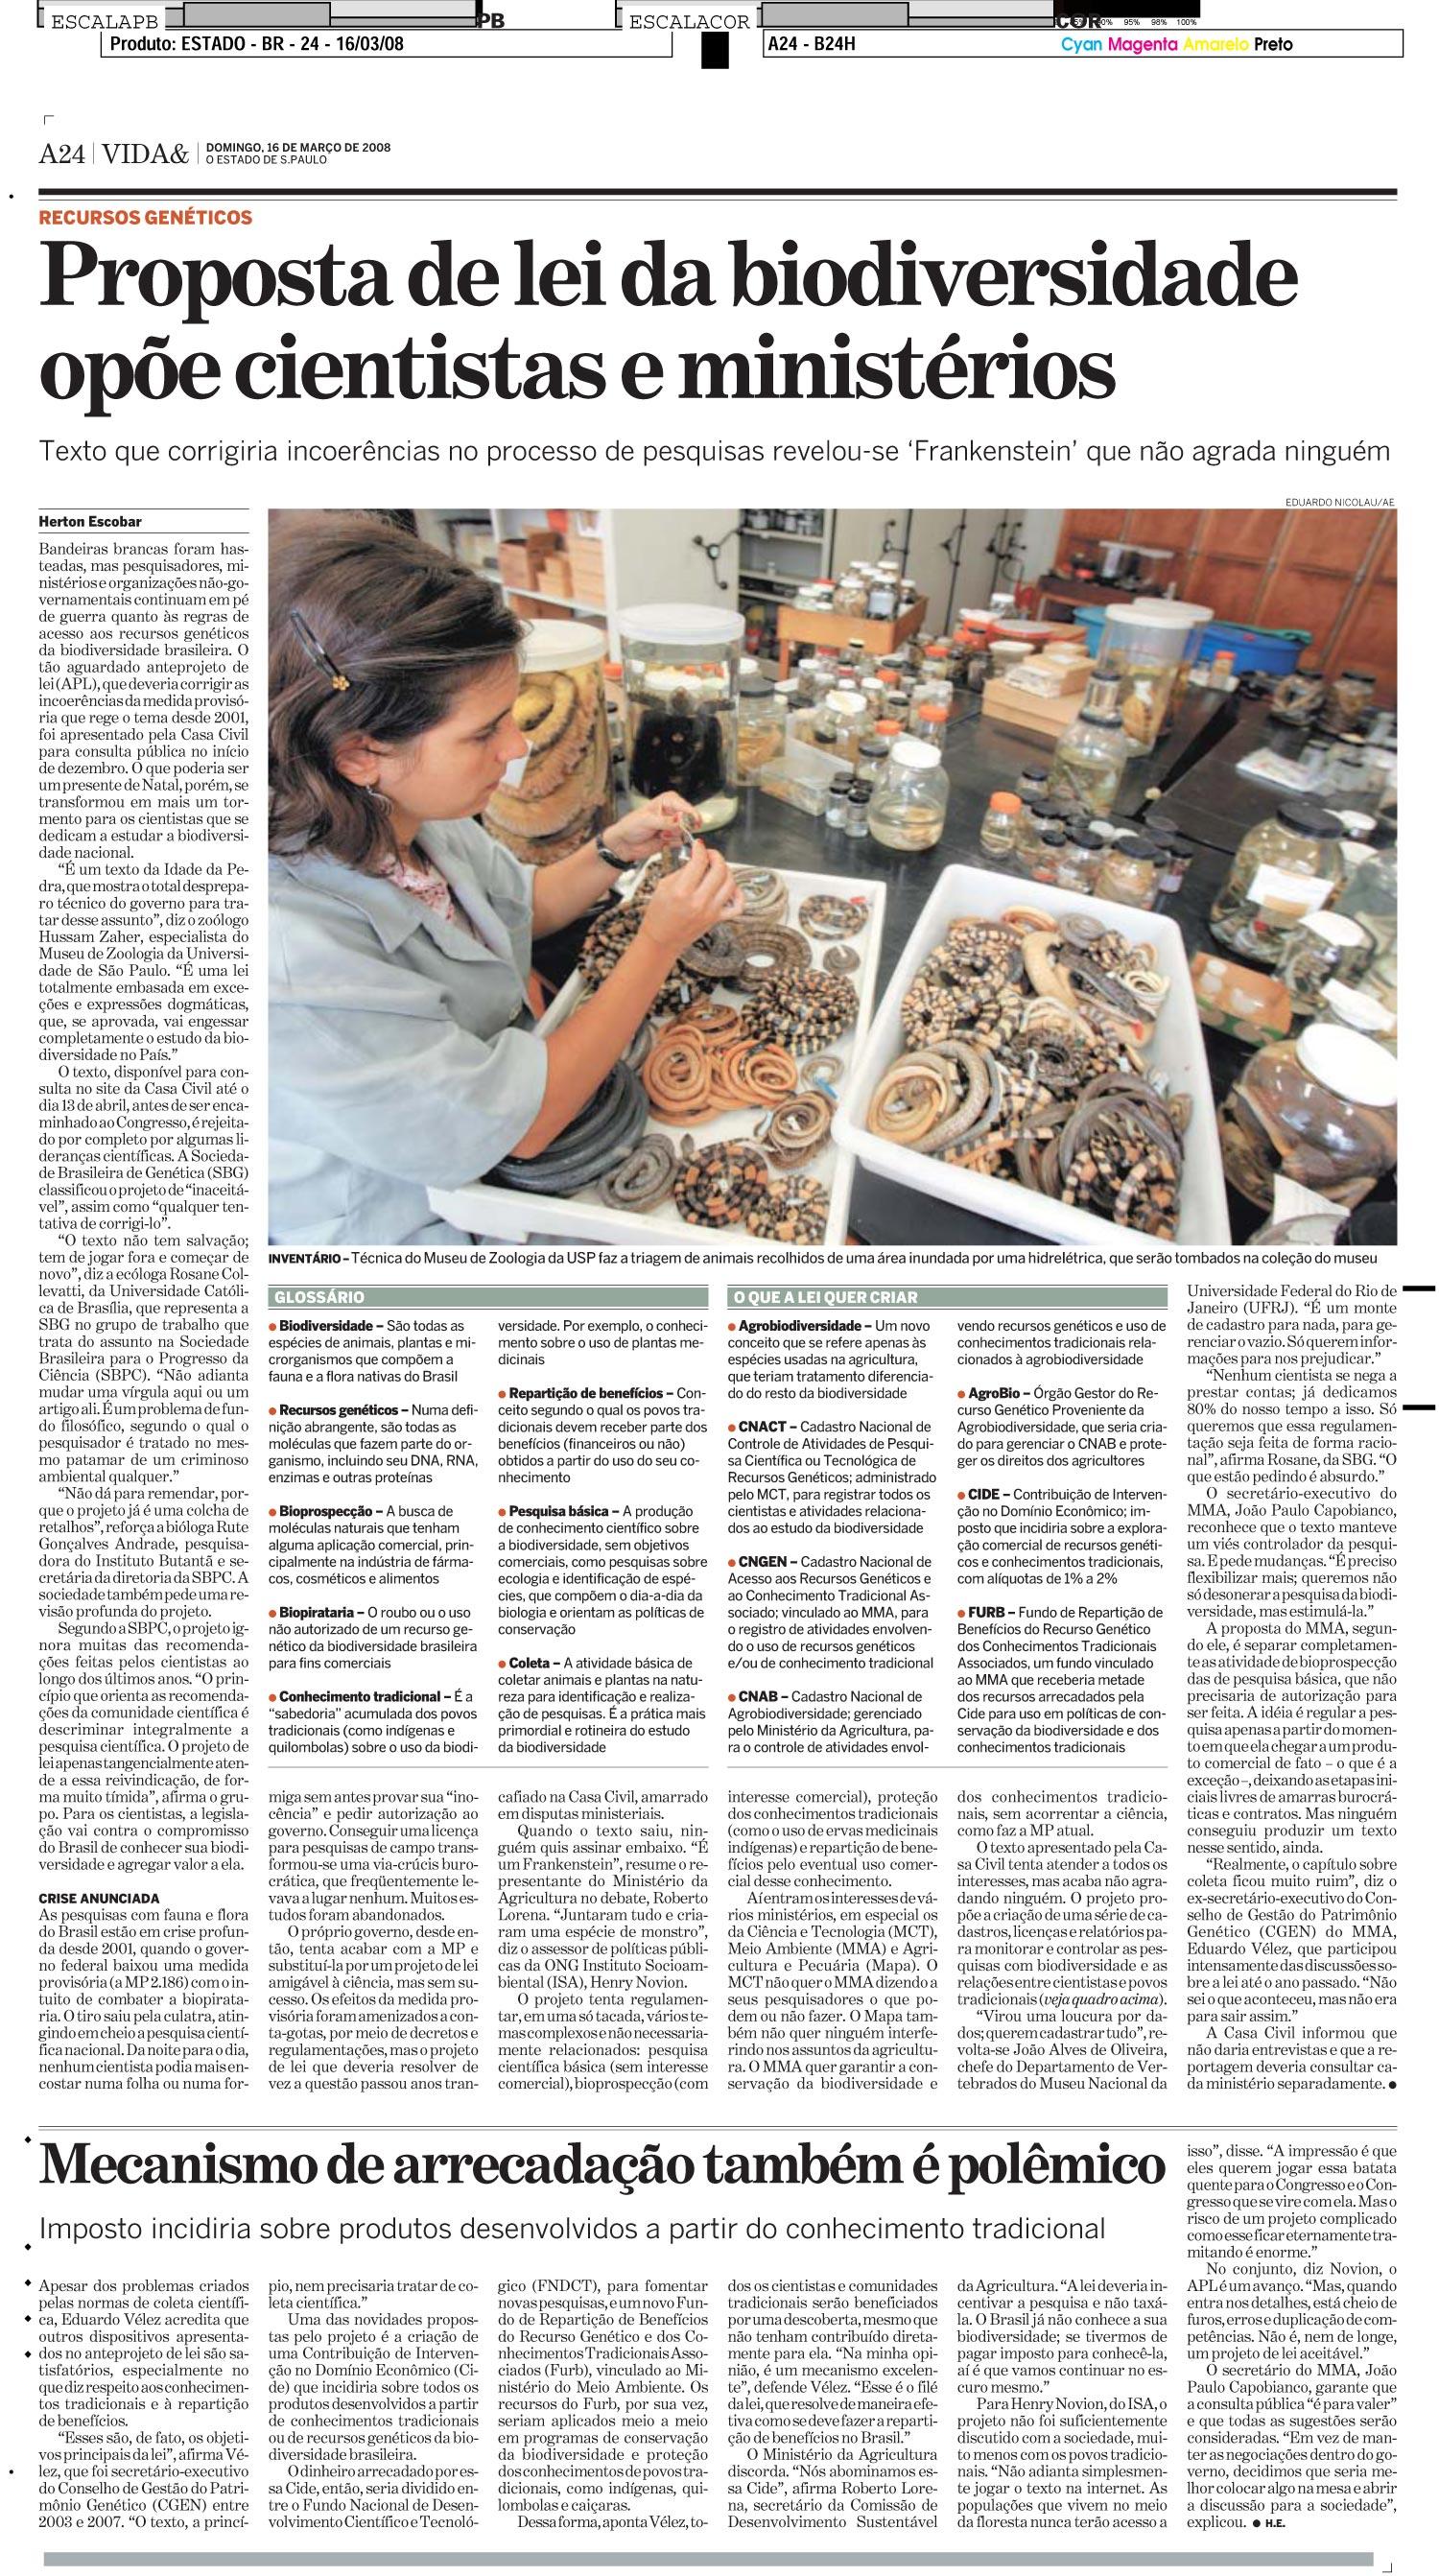 Proposta de lei da biodiversidade opõe cientistas e ministérios